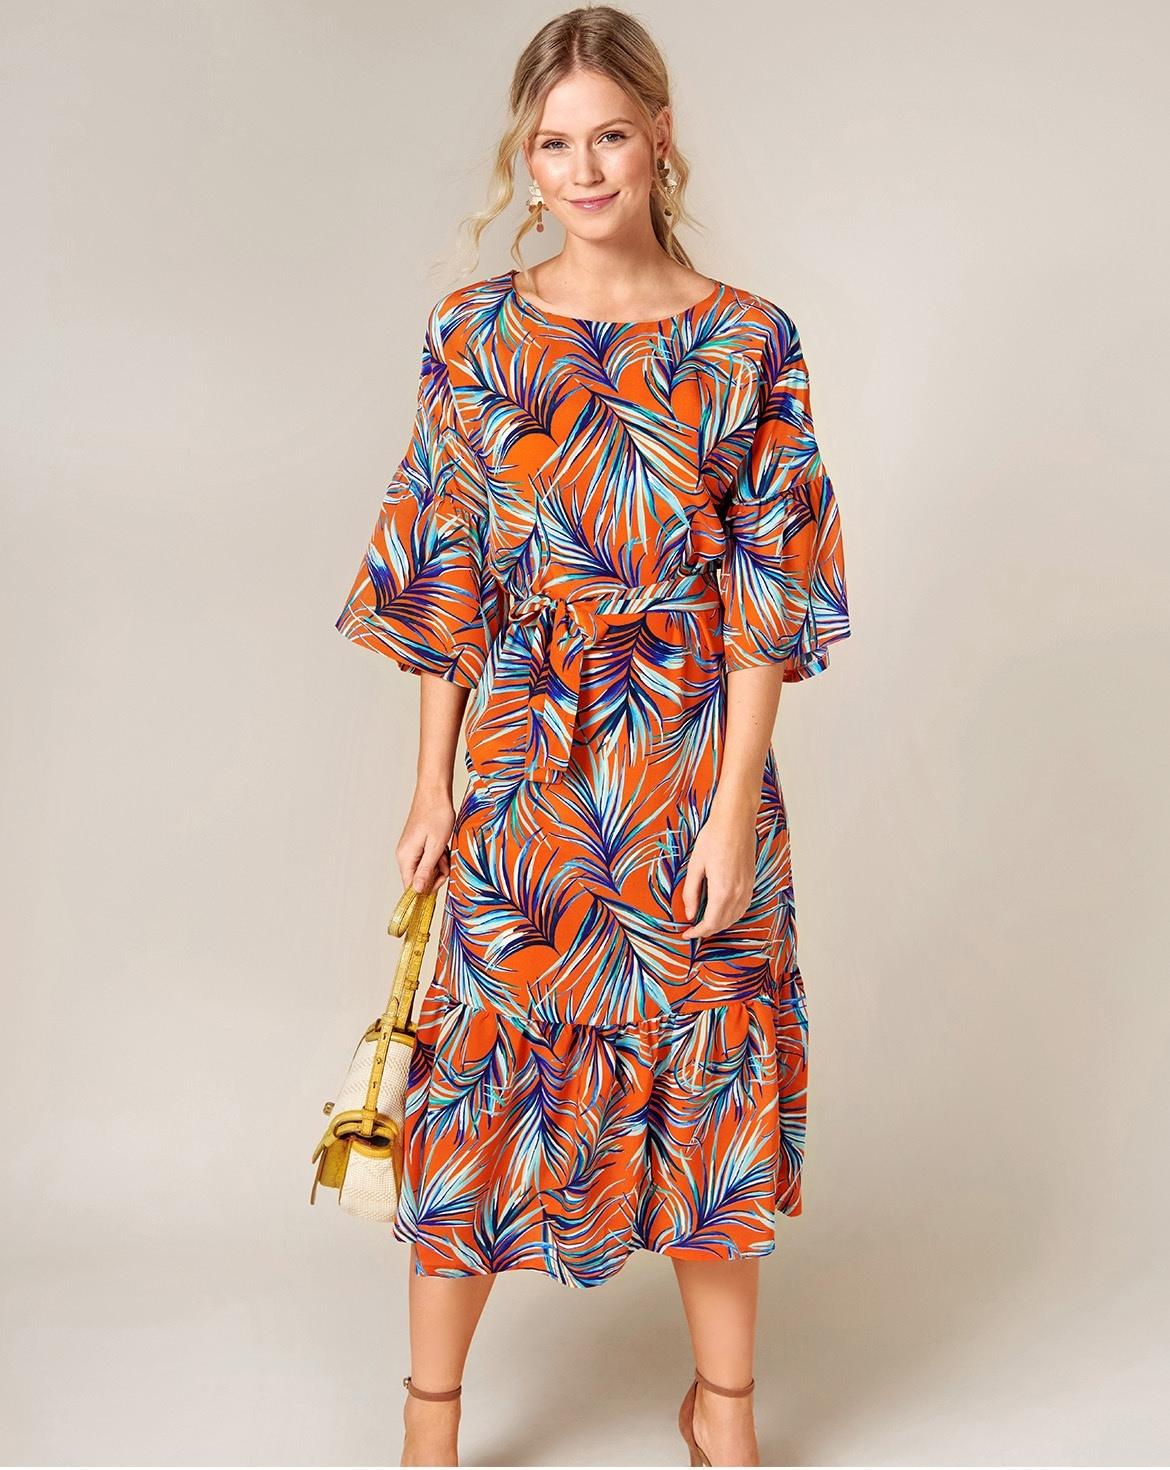 Einzigartig Kleider Ab Größe 40 Ärmel13 Großartig Kleider Ab Größe 40 Design